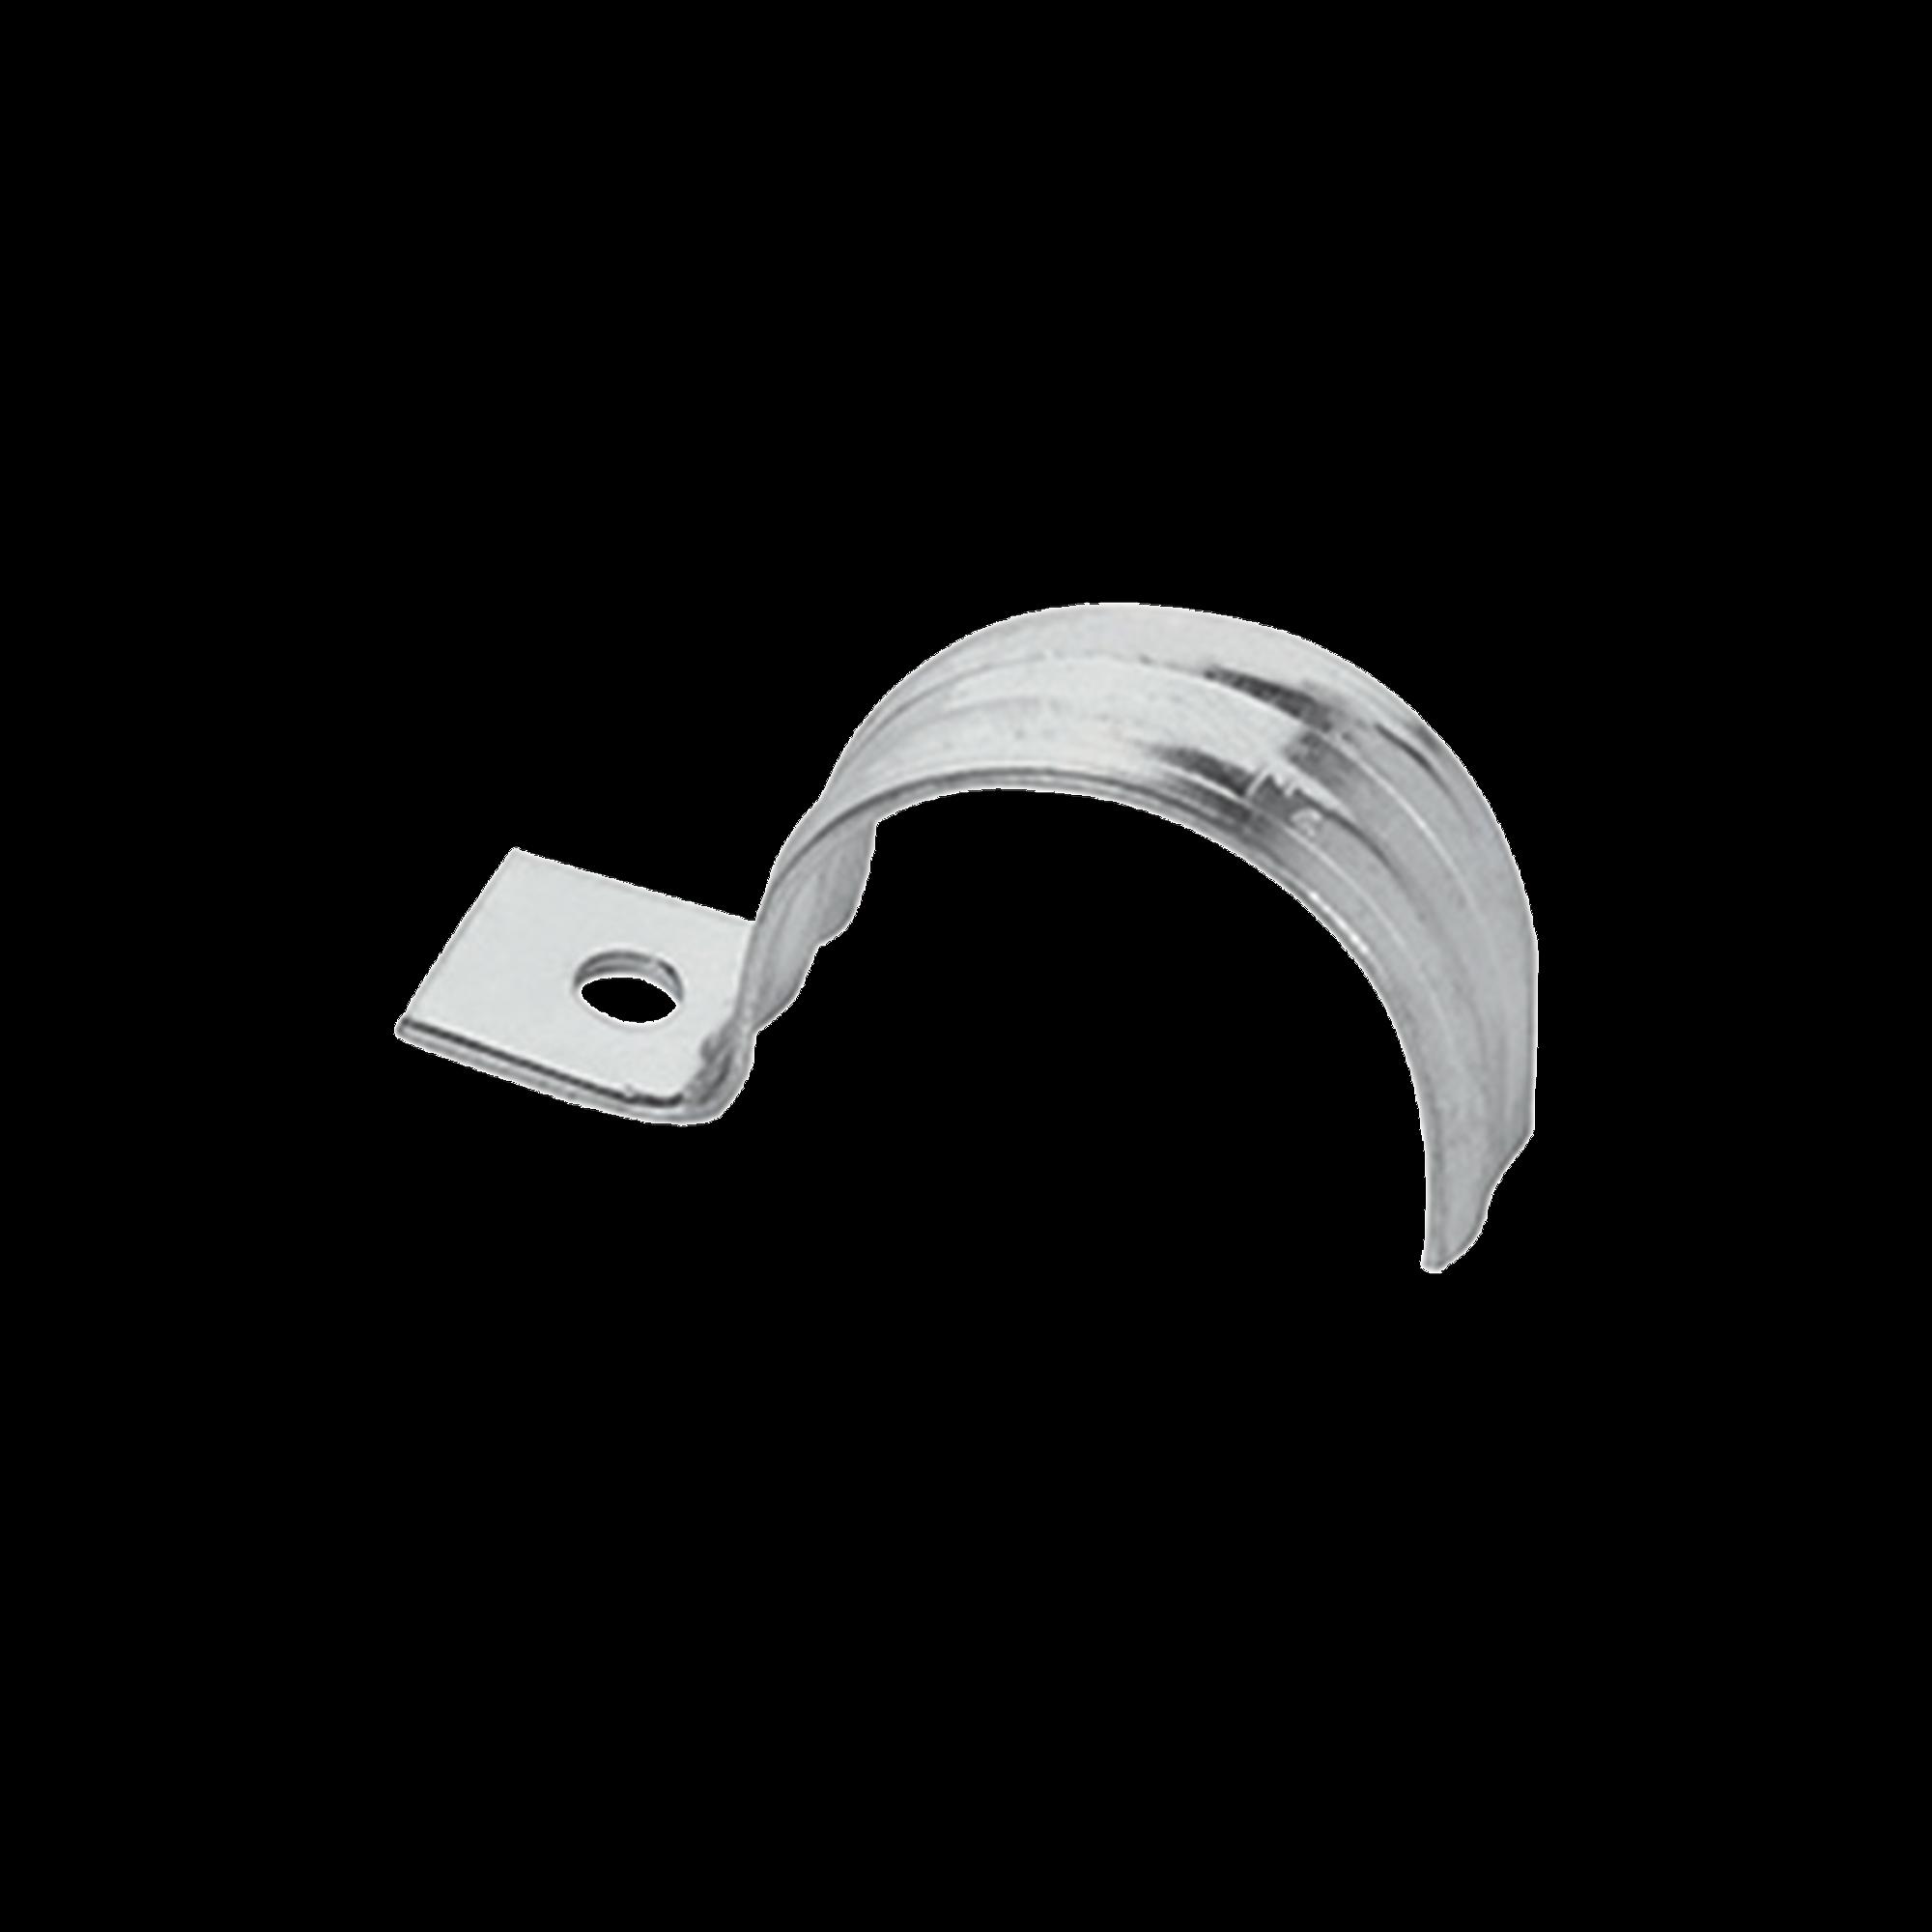 Abrazadera para tubo tipo uña 1 1/4 bolsa con 5 piezas